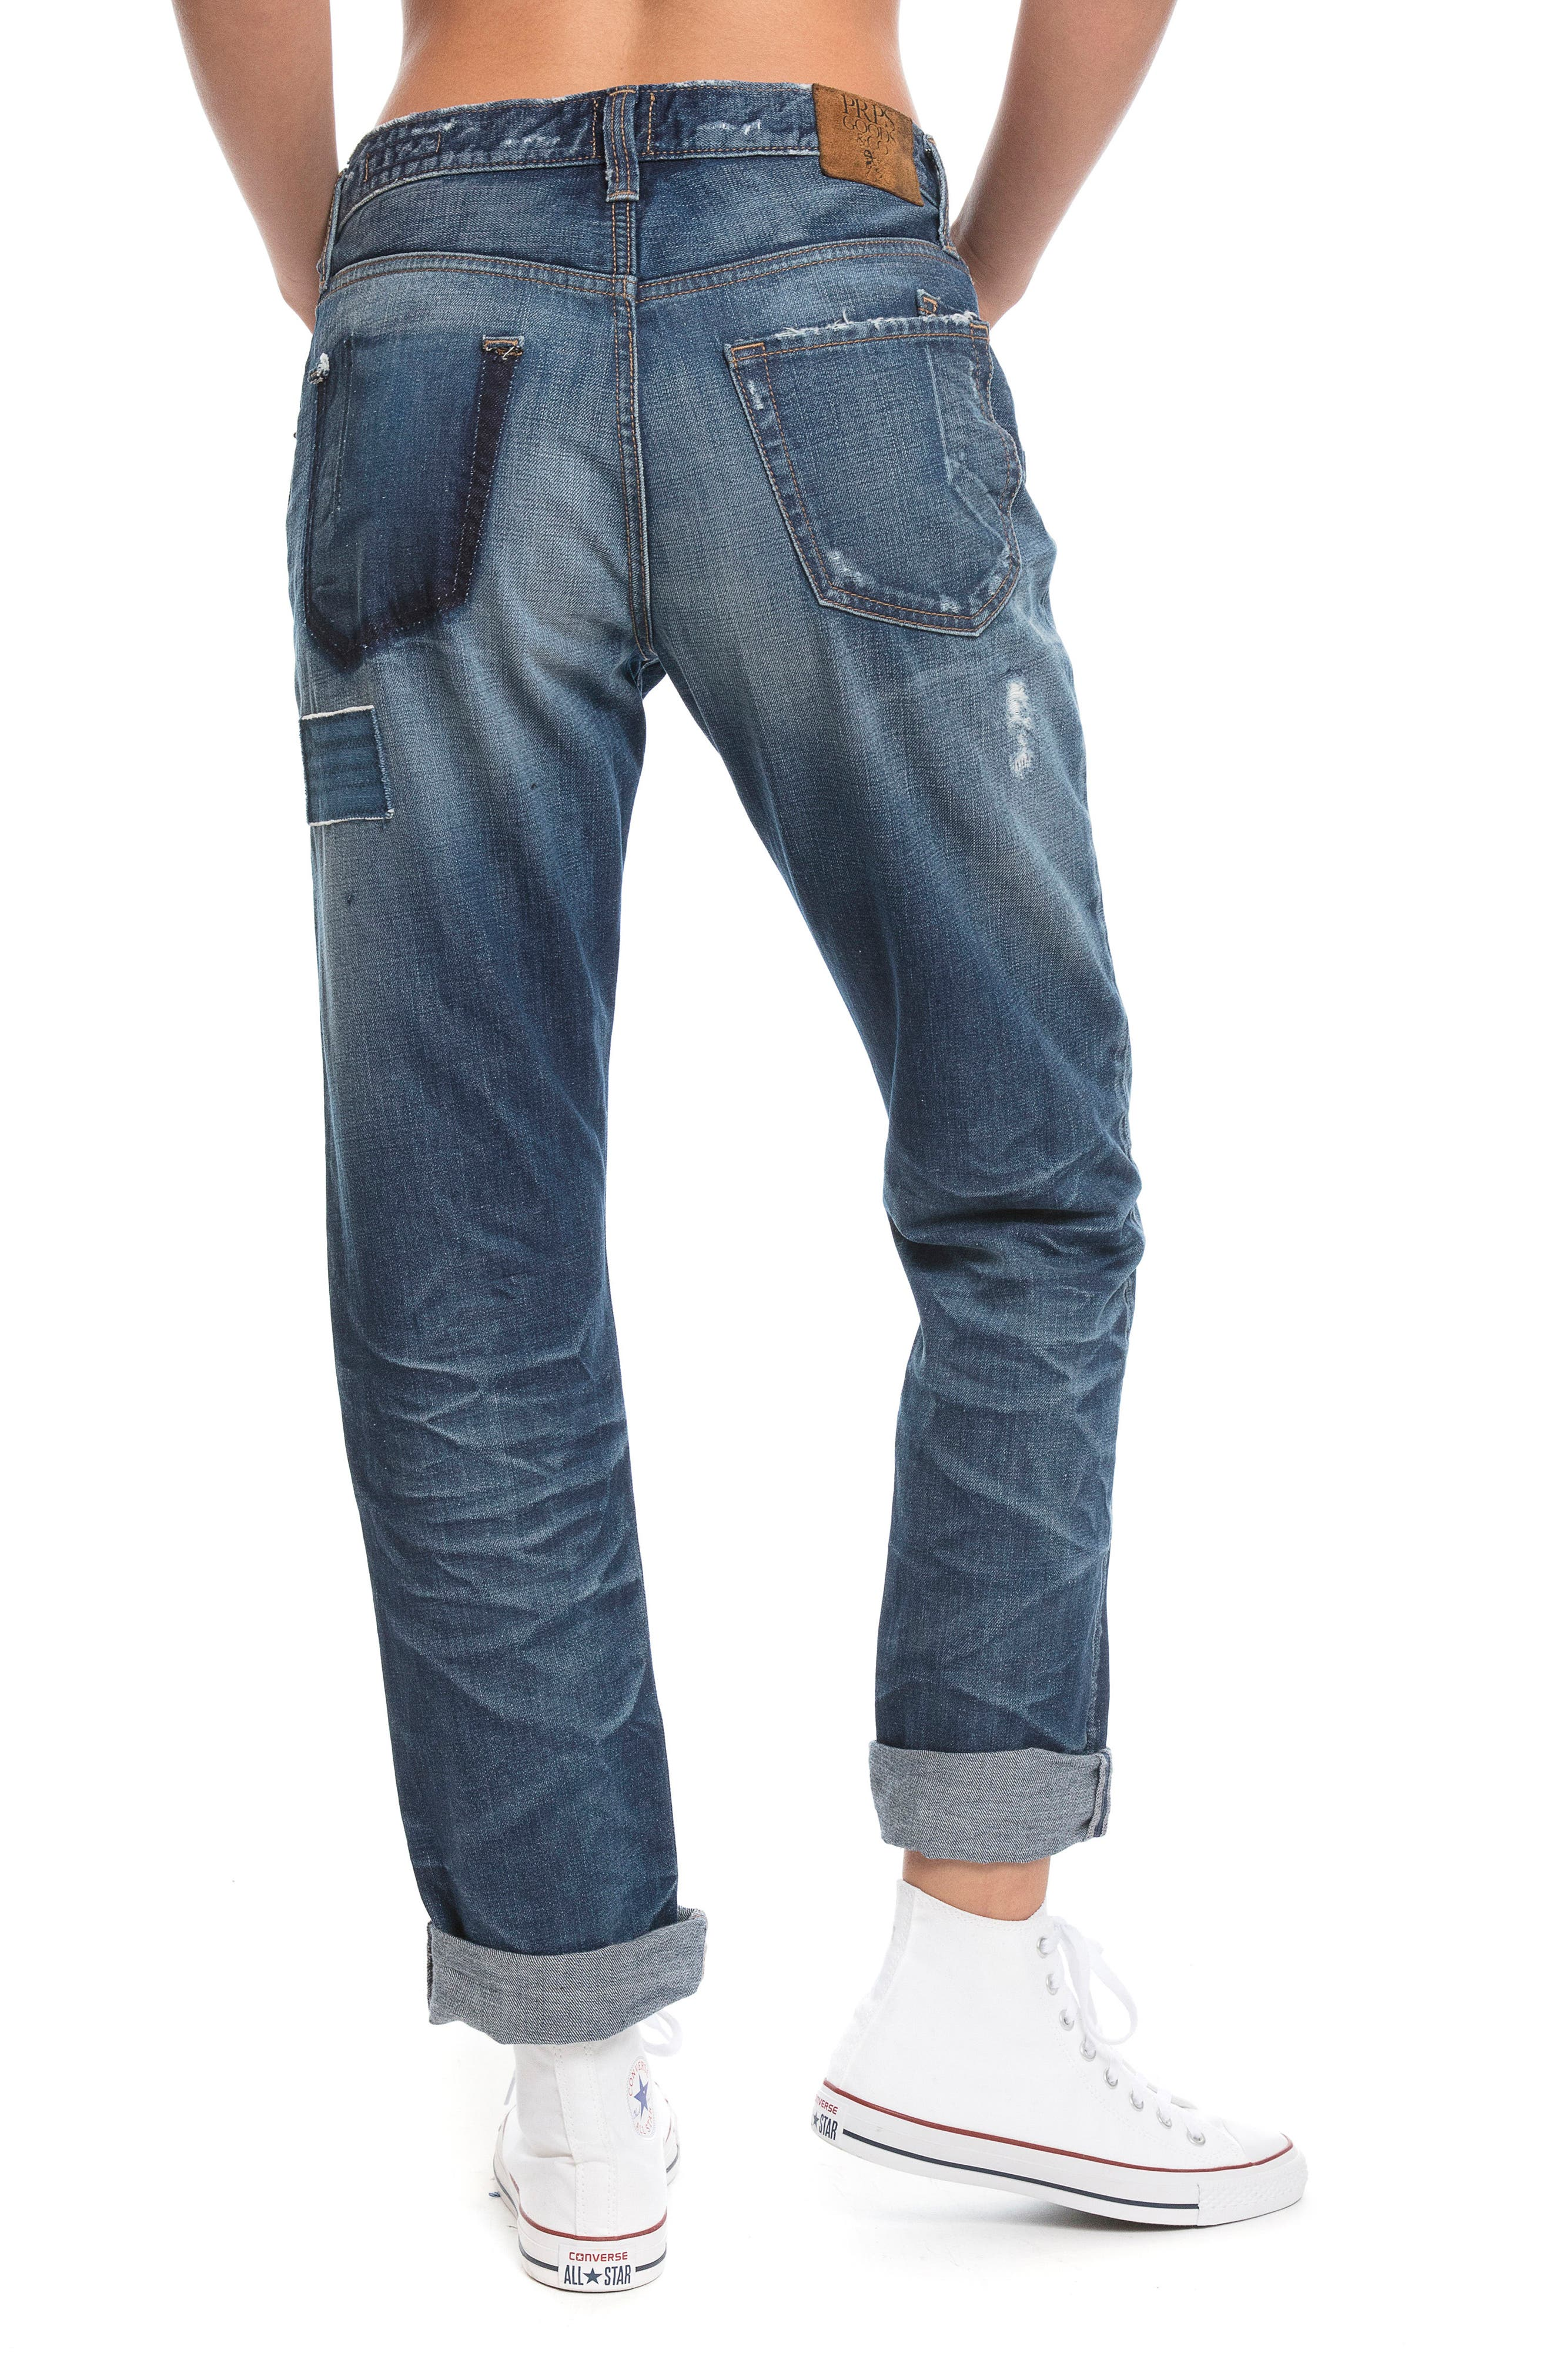 El Camino - Patch It Boyfriend Jeans,                             Alternate thumbnail 3, color,                             INDIGO